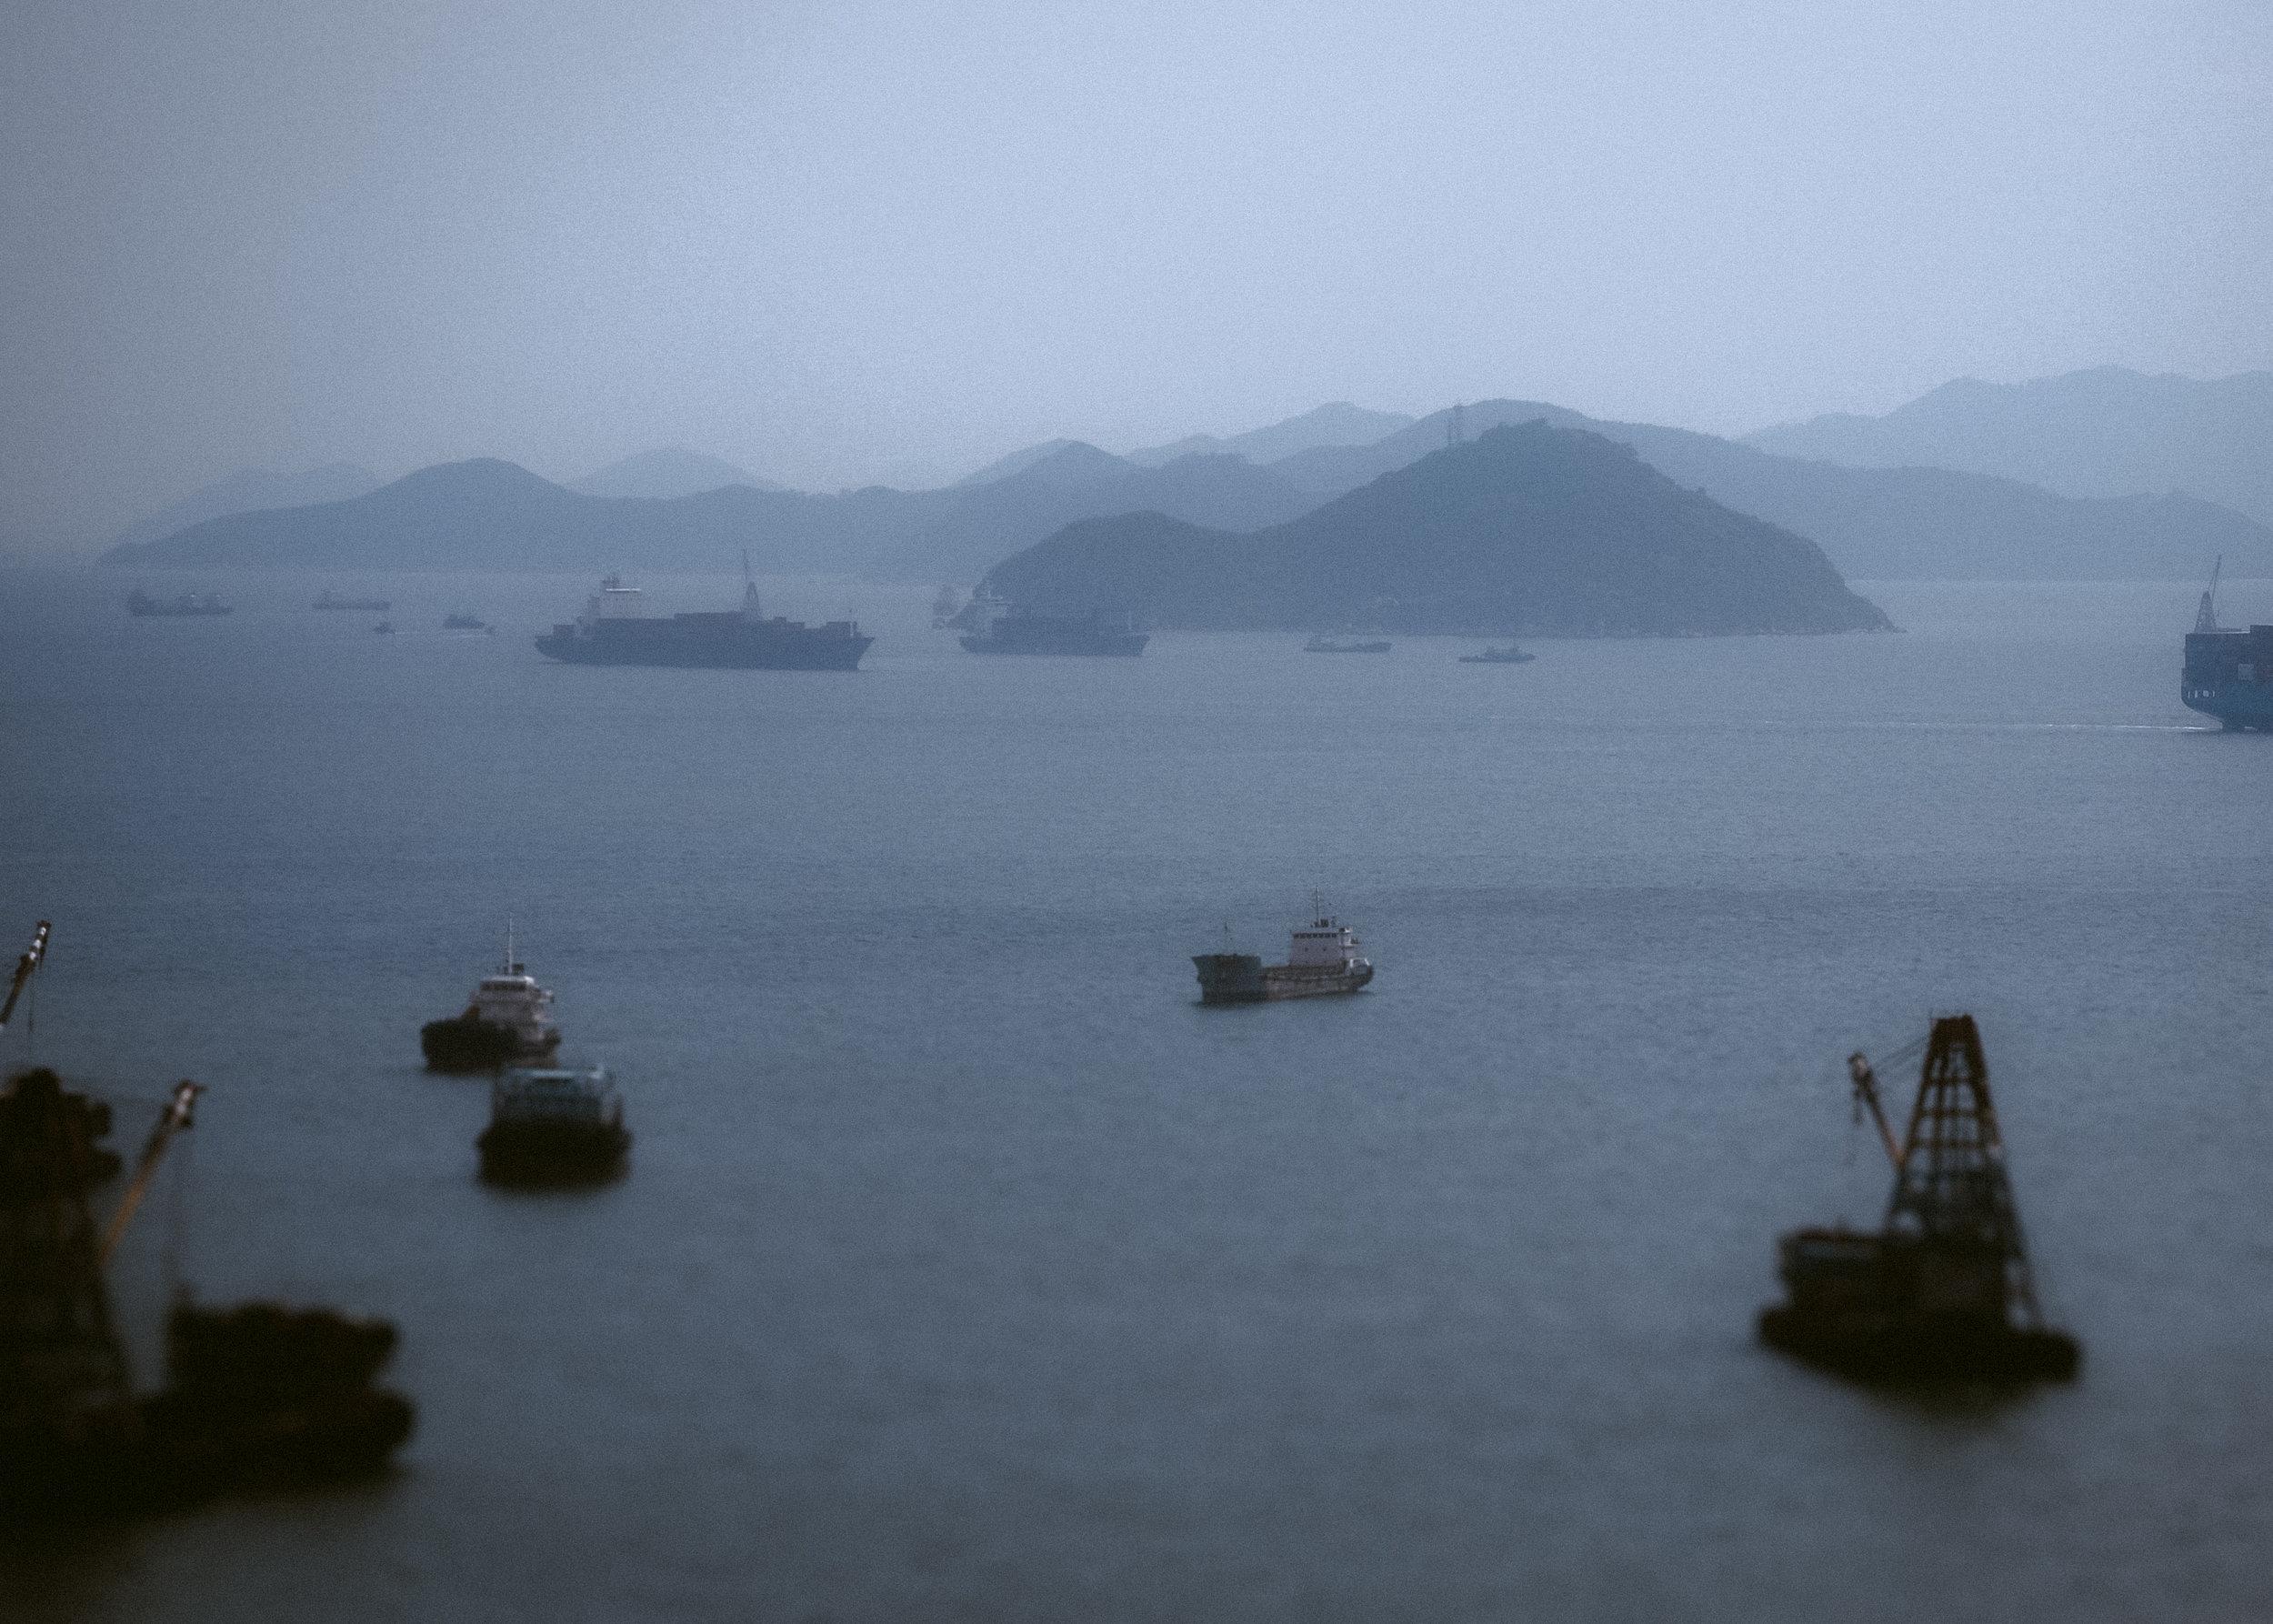 jonathan-burkhart-photographer-oklahoma-city-hongkong-china.jpg